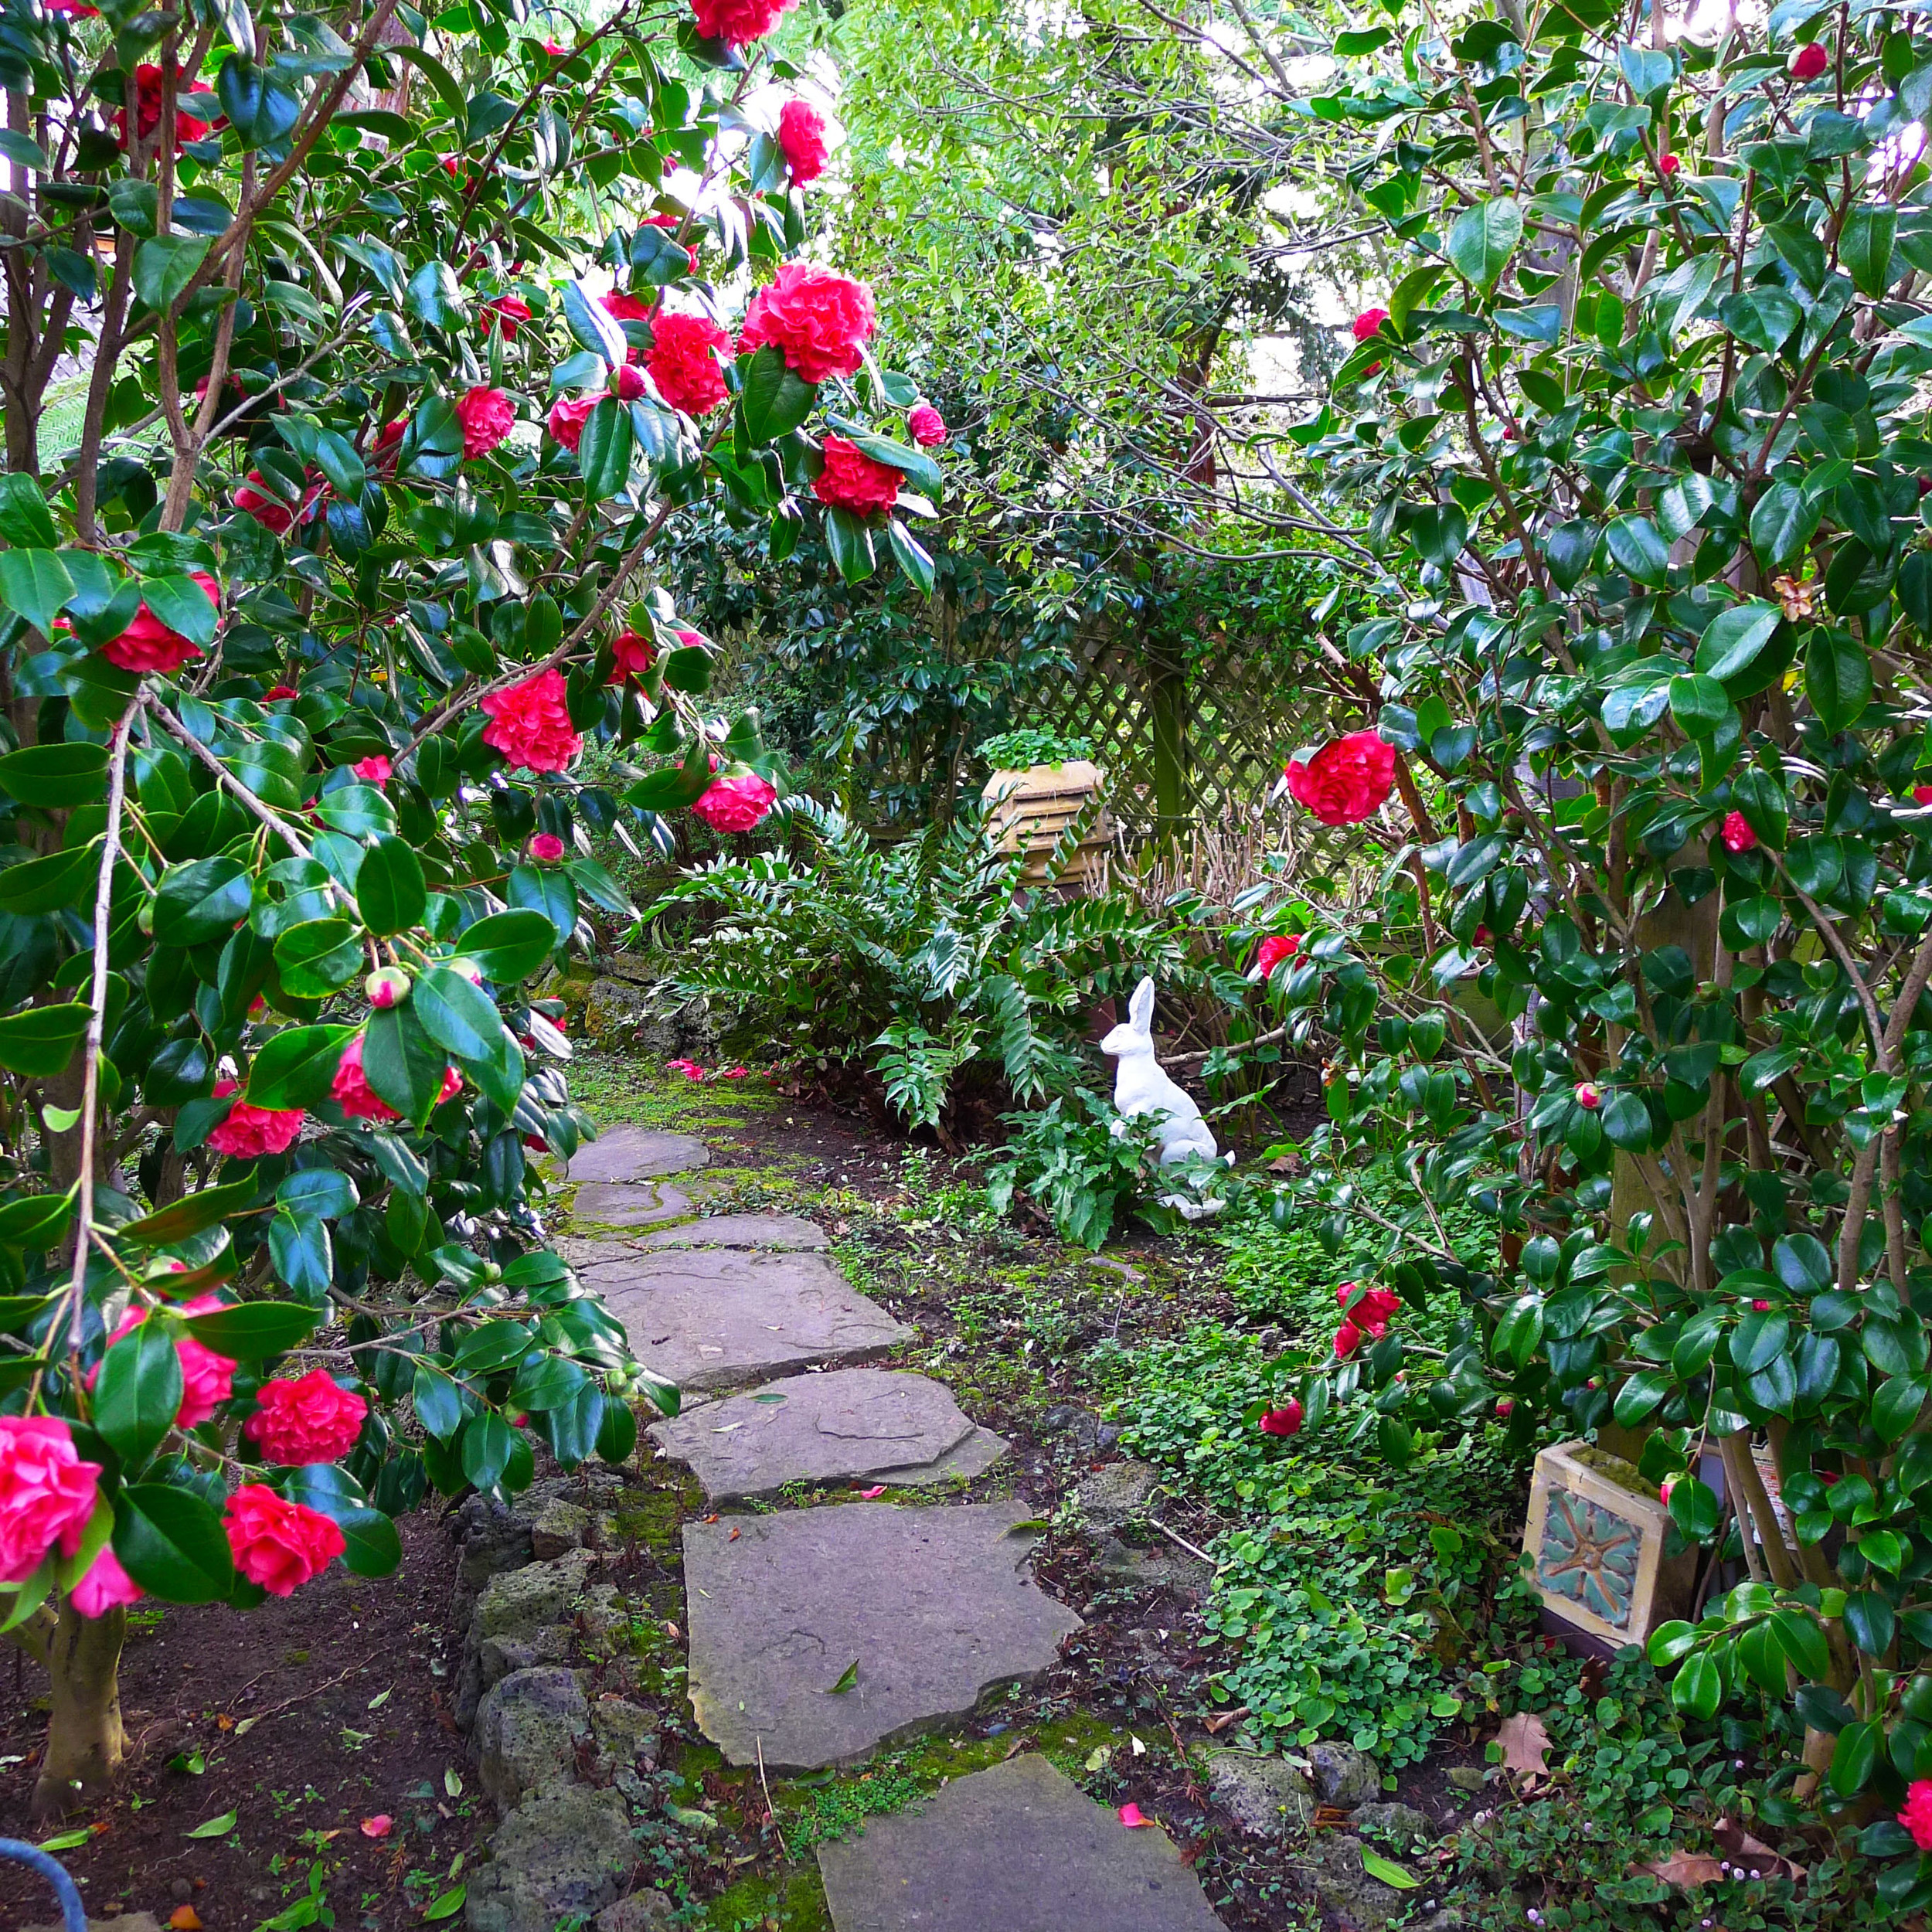 A cheeky rabbit inhabits the garden